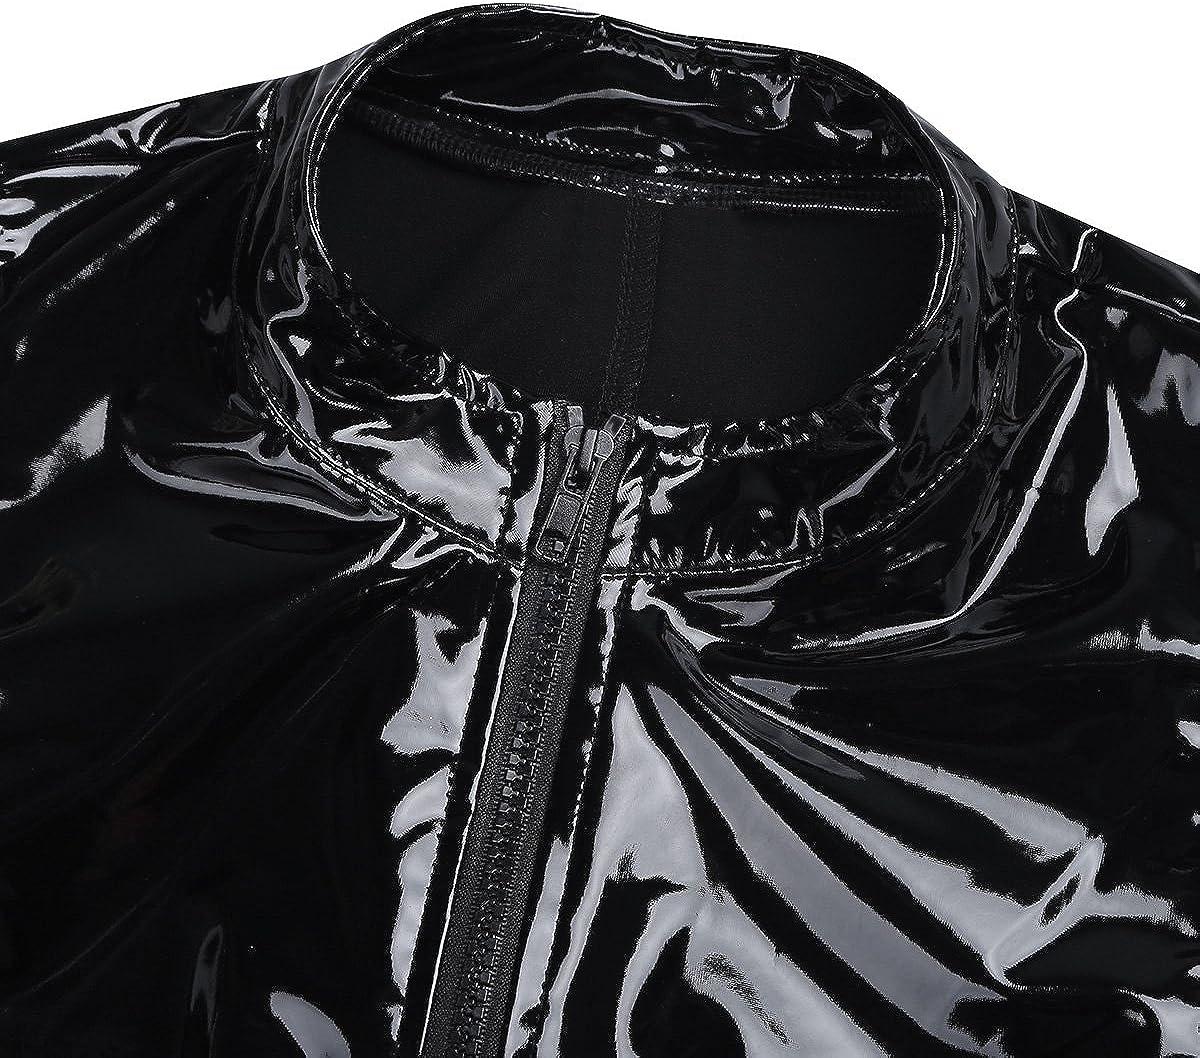 ranrann Mens One Piece PVC Leather Bodysuit Sleeveless Welook Jumpsuit High Cut Thongs Leotard